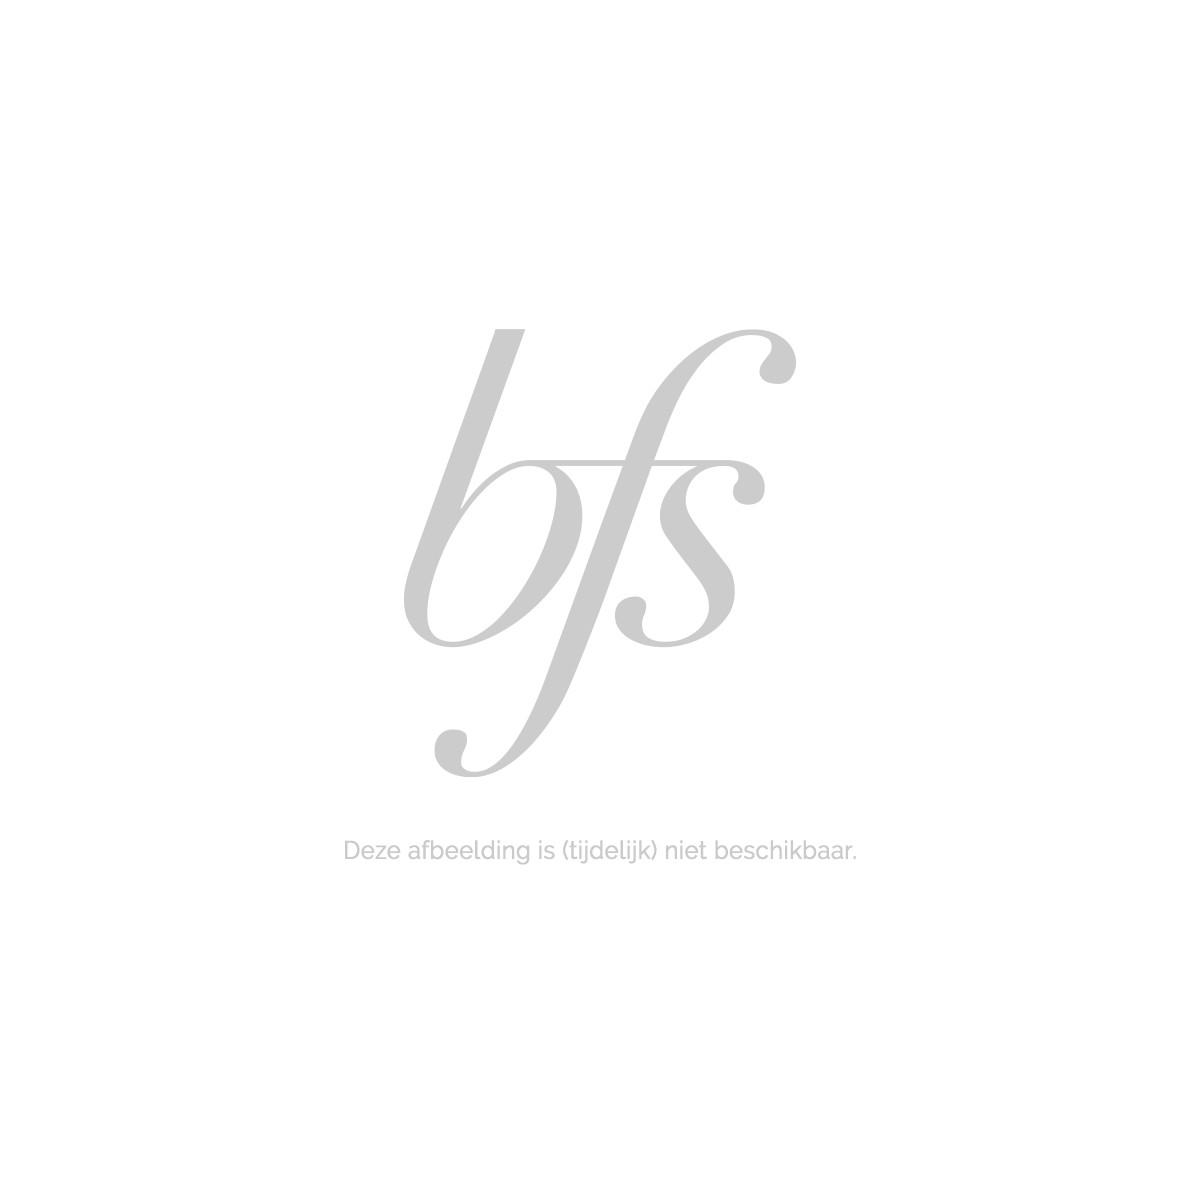 Estee Lauder Double Wear Zero-Smudge Lenghten. Mascara #01 Black 6 ml